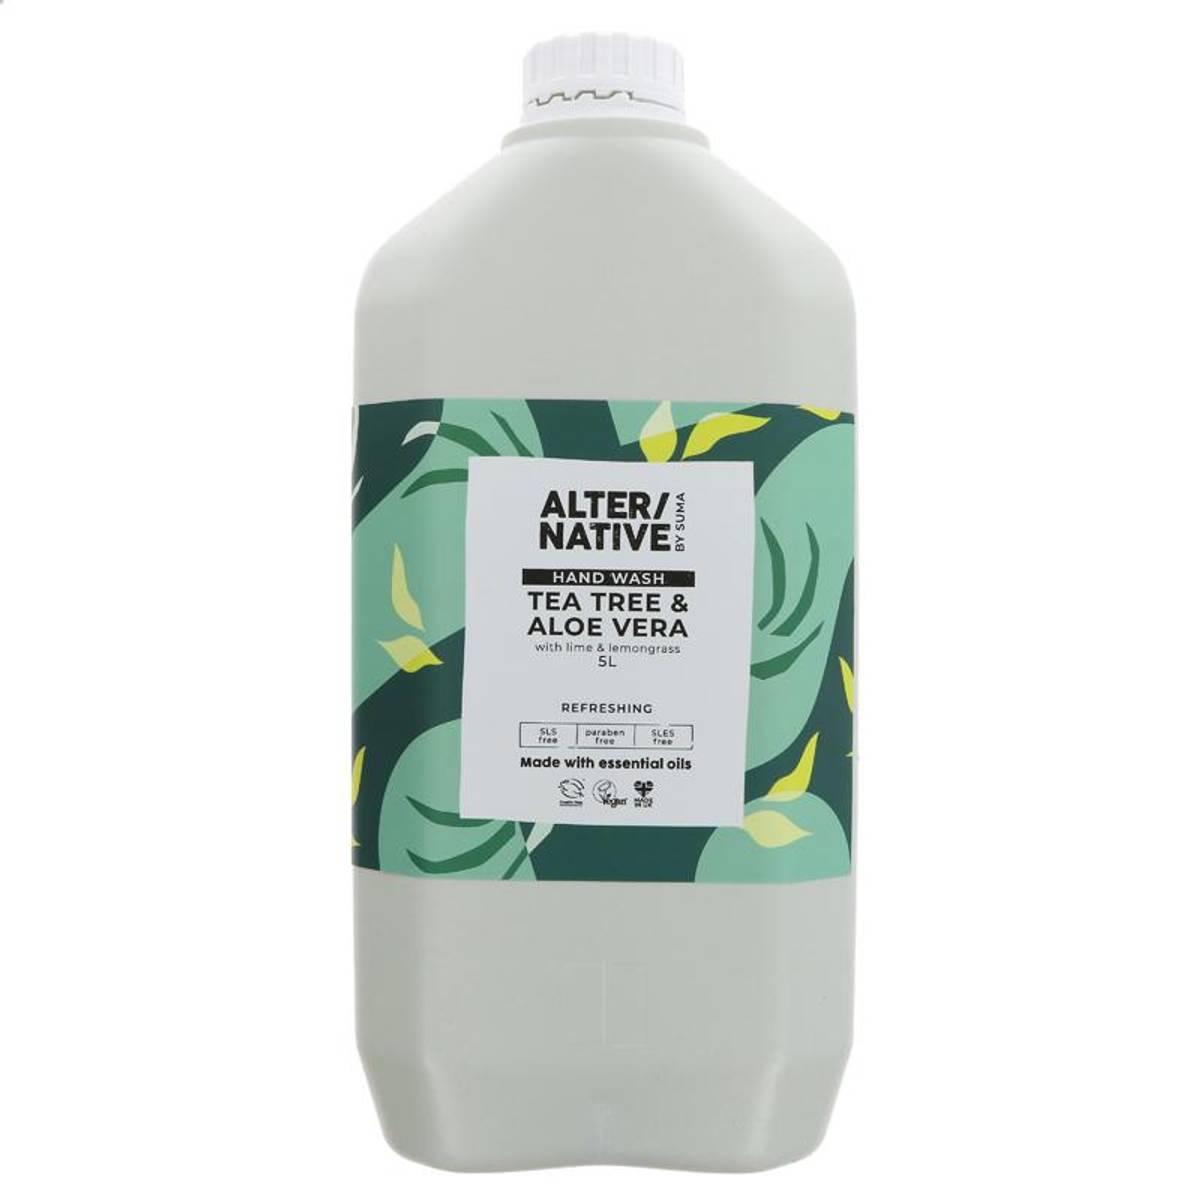 5L flytende håndsåpe Tea Tree & Aloe Vera / Alter/native